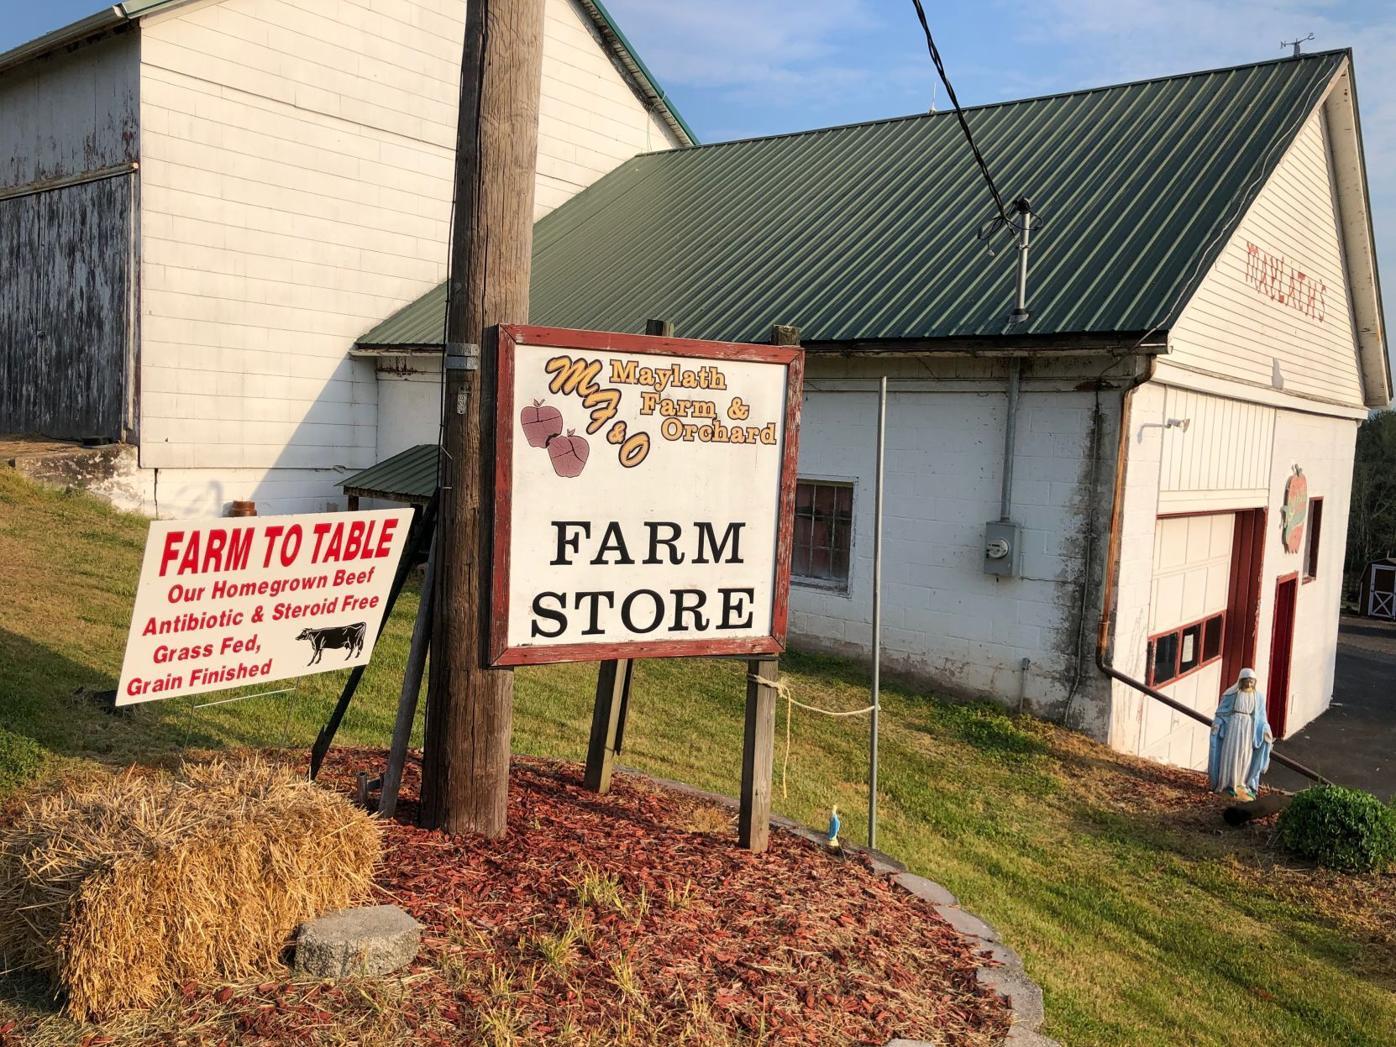 Maylath's Farm Store